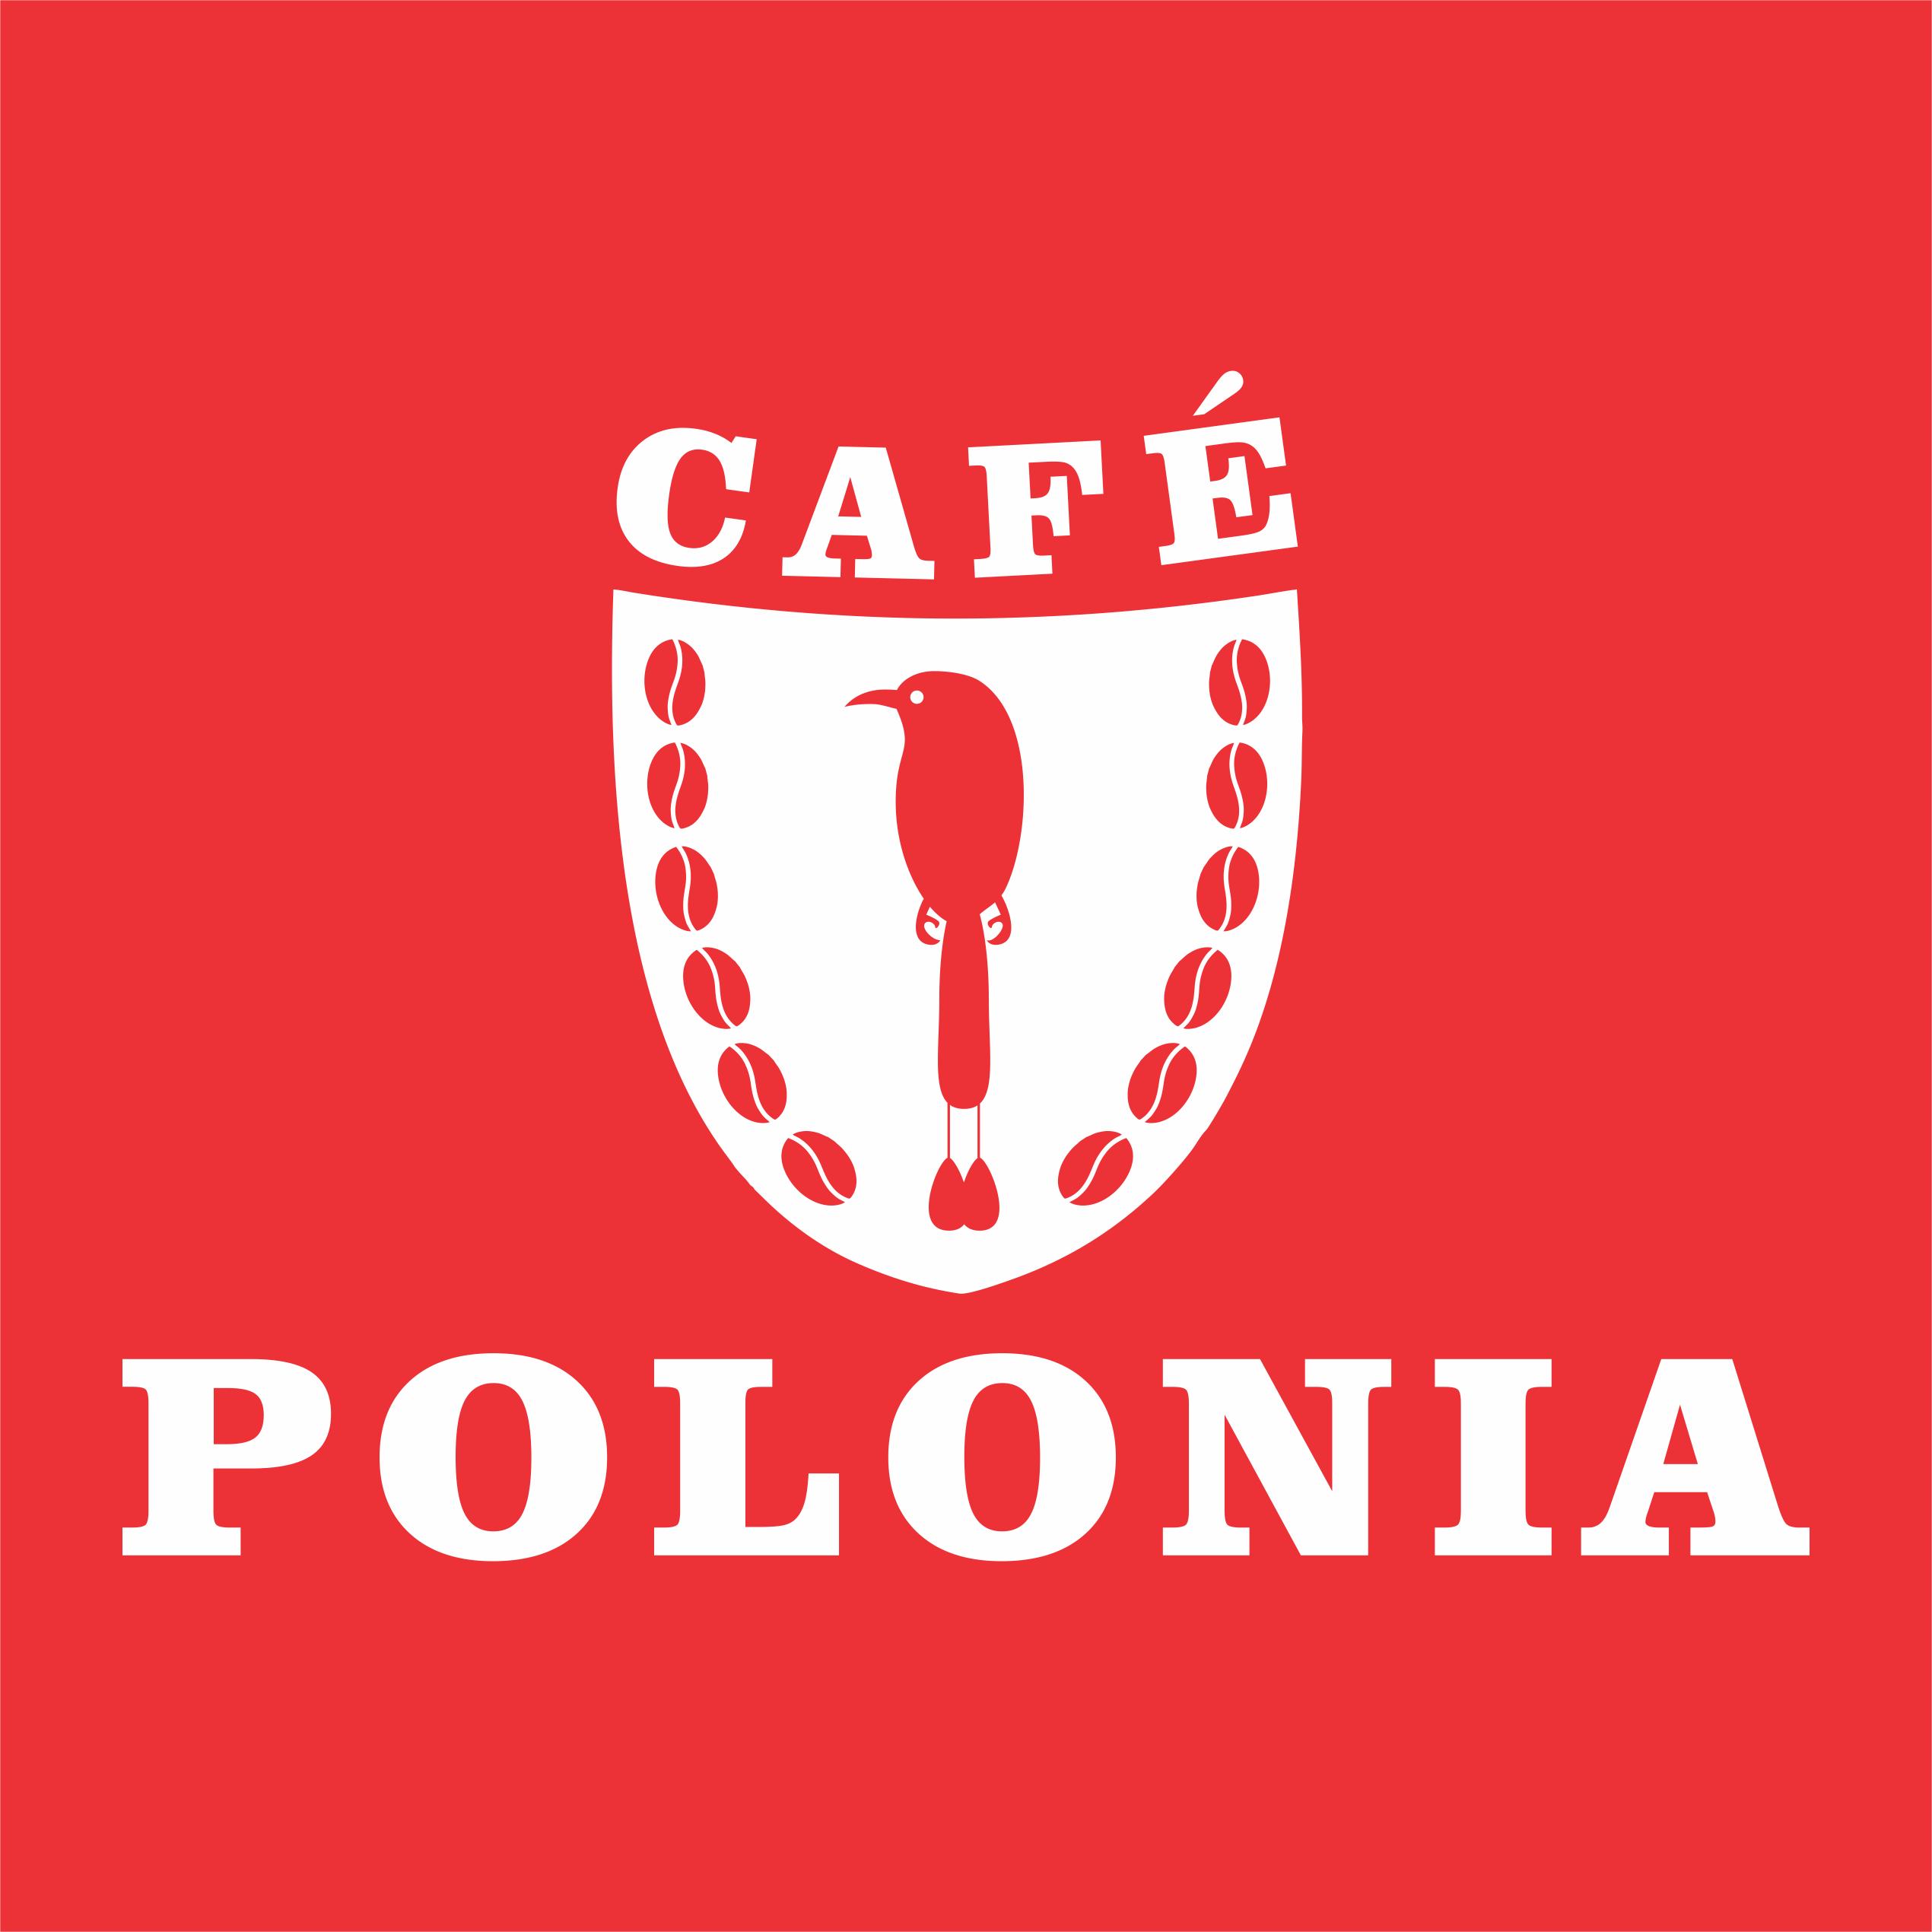 CAFÉ POLONIA | COLOMBIA